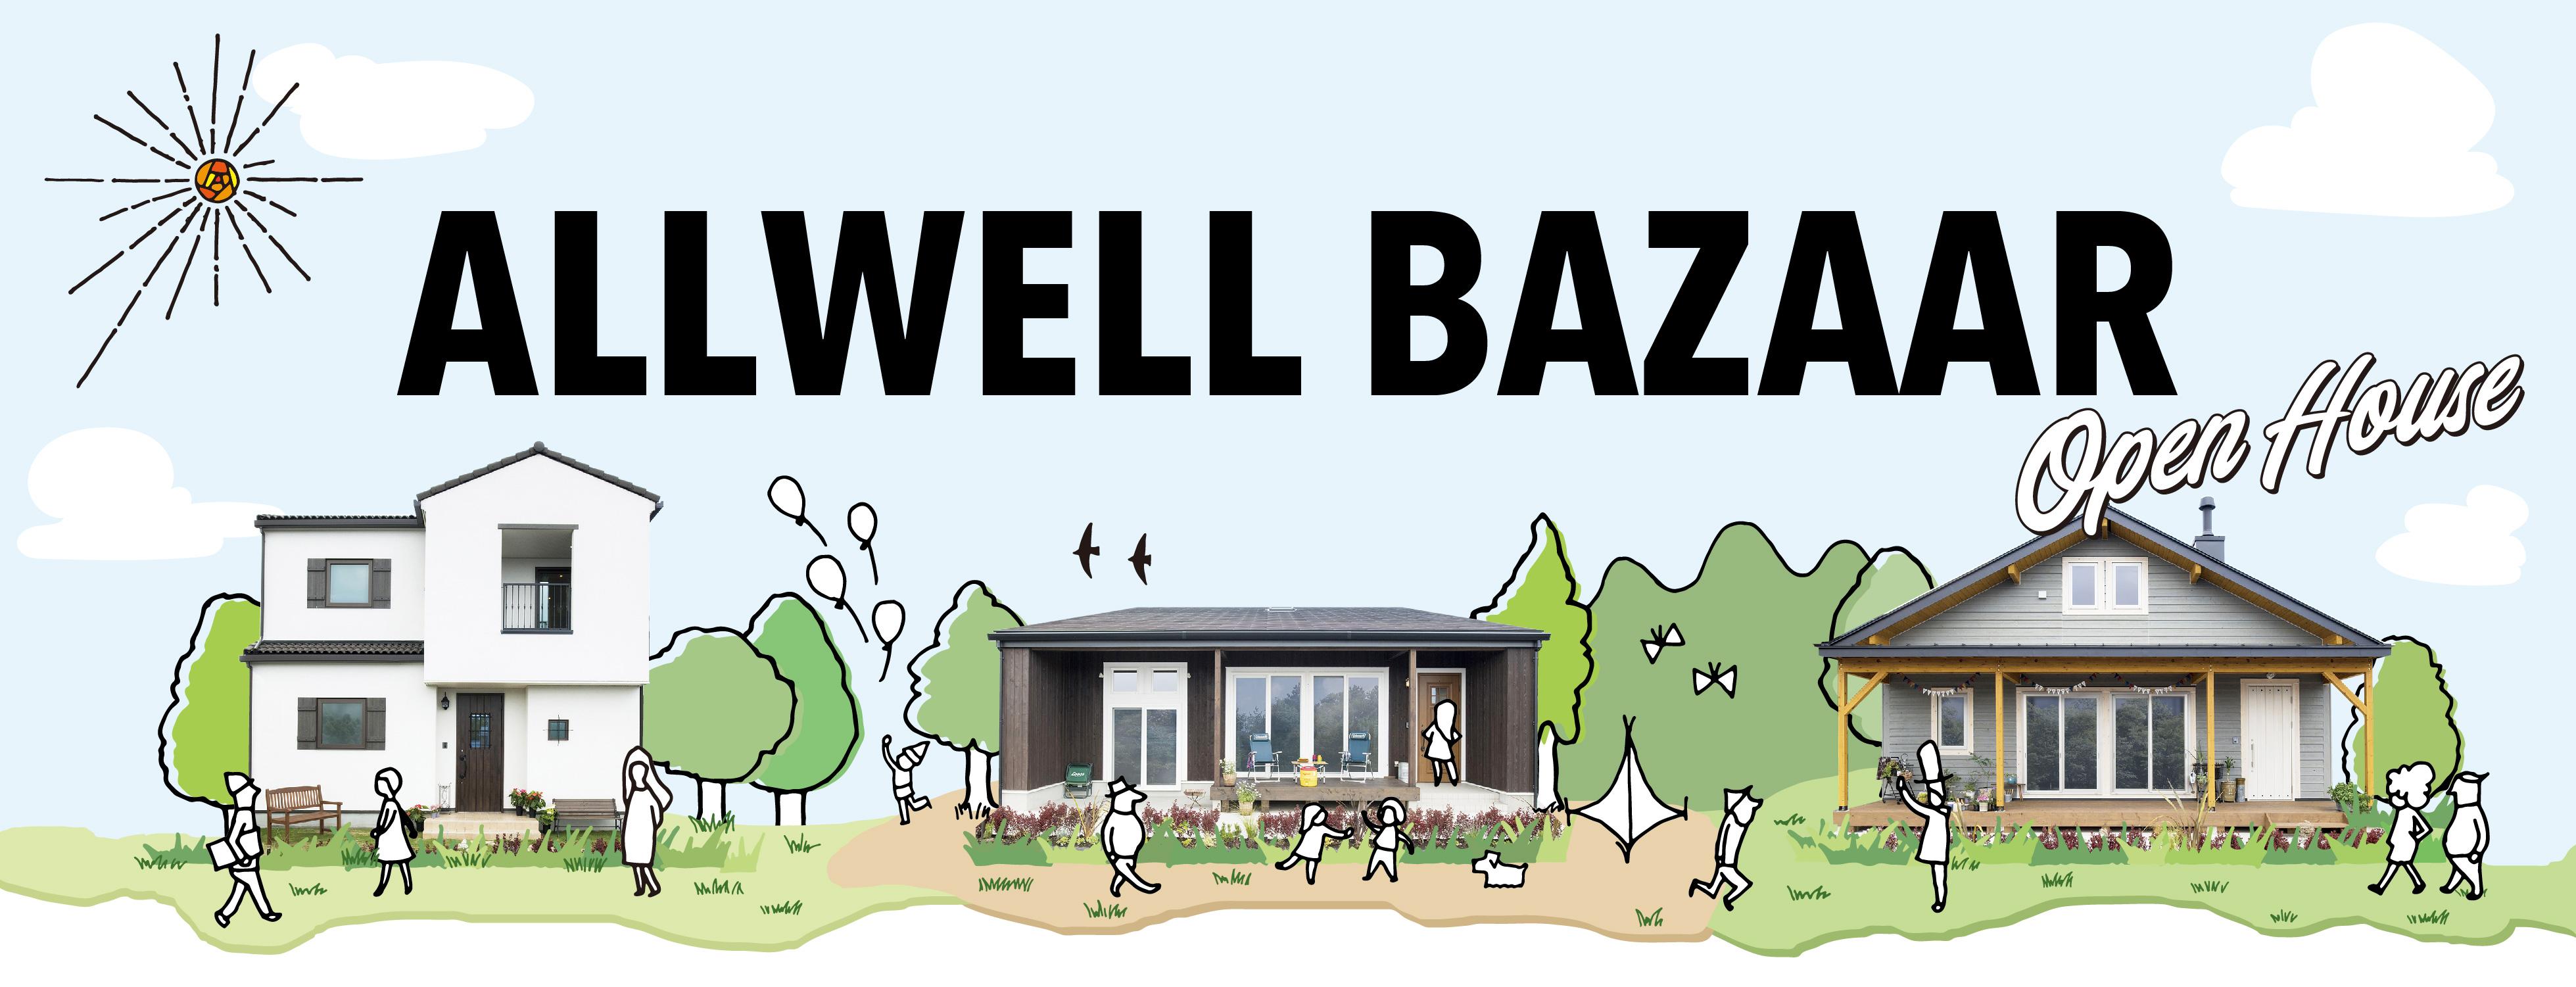 ALLWELL BAZAAR 2020/1/19に開催決定!